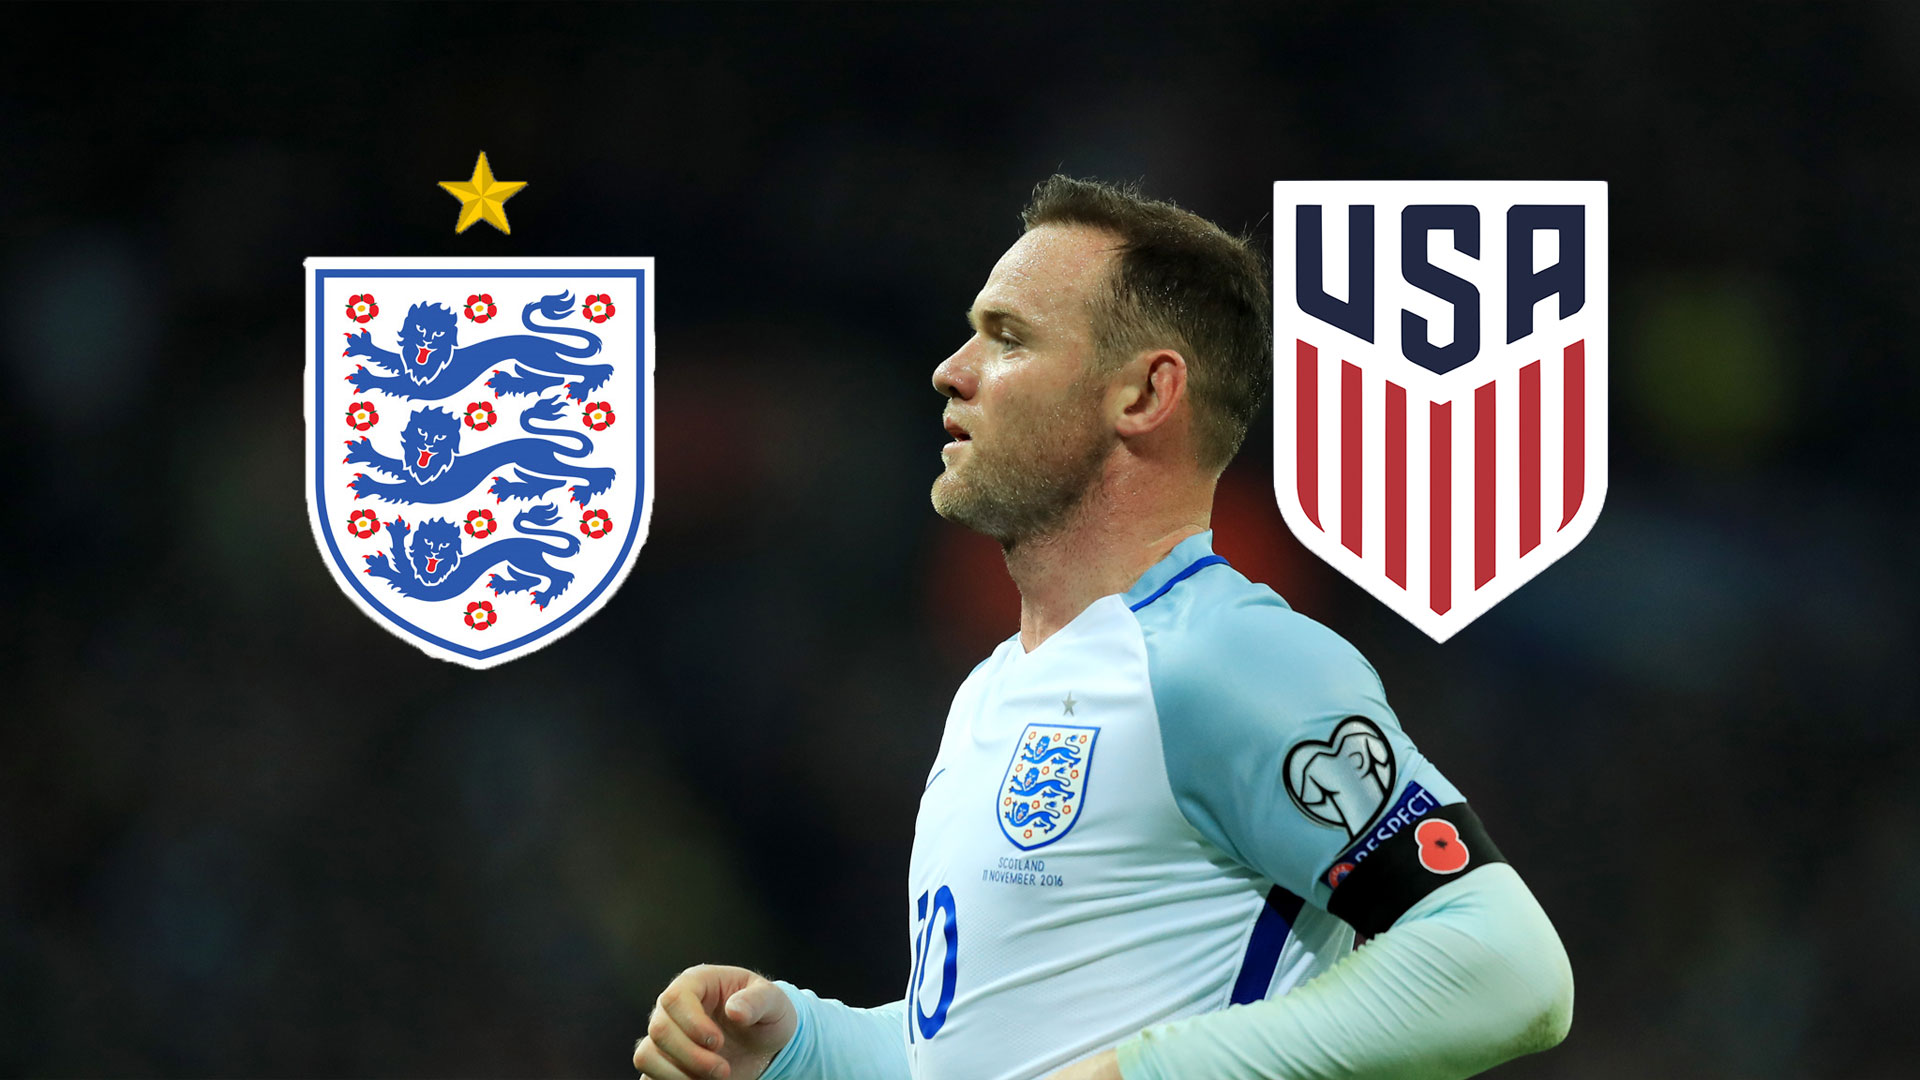 England USA TV LIVE STREAM DAZN WAYNE ROONEY